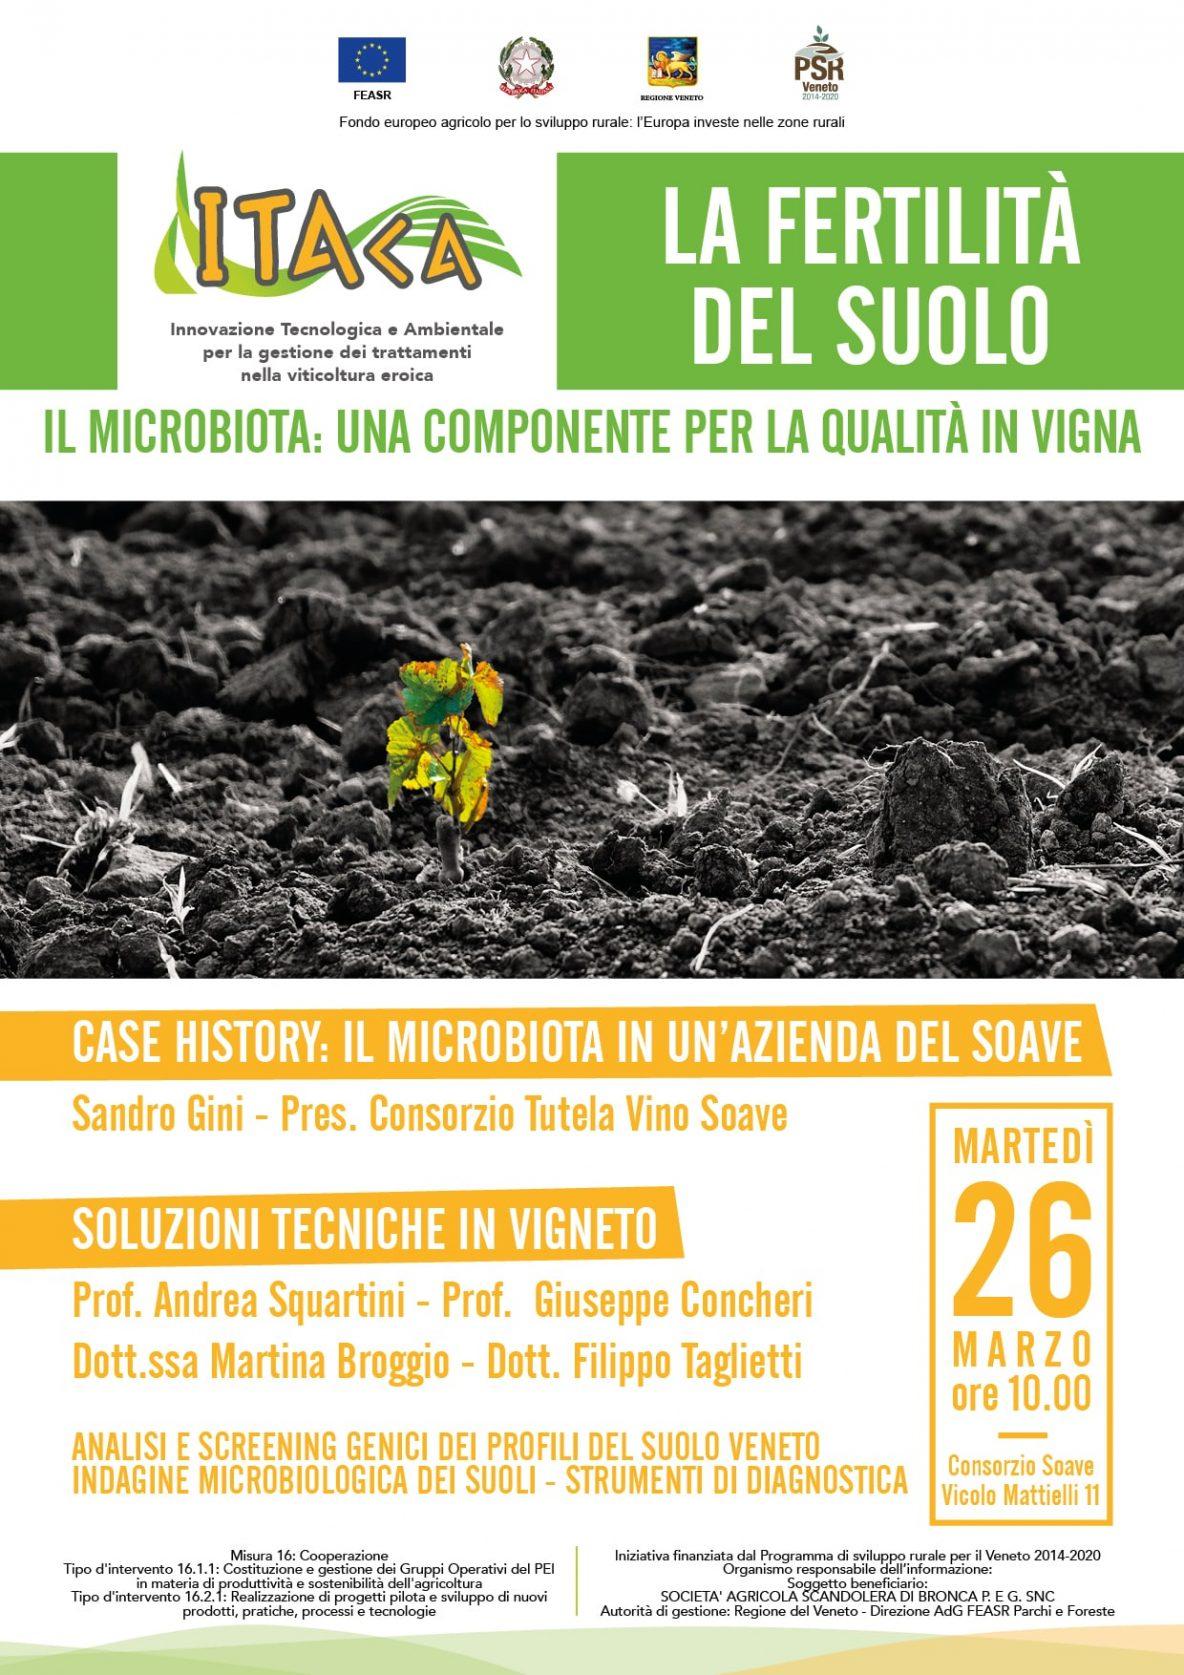 Fertilita del suolo - Itaca